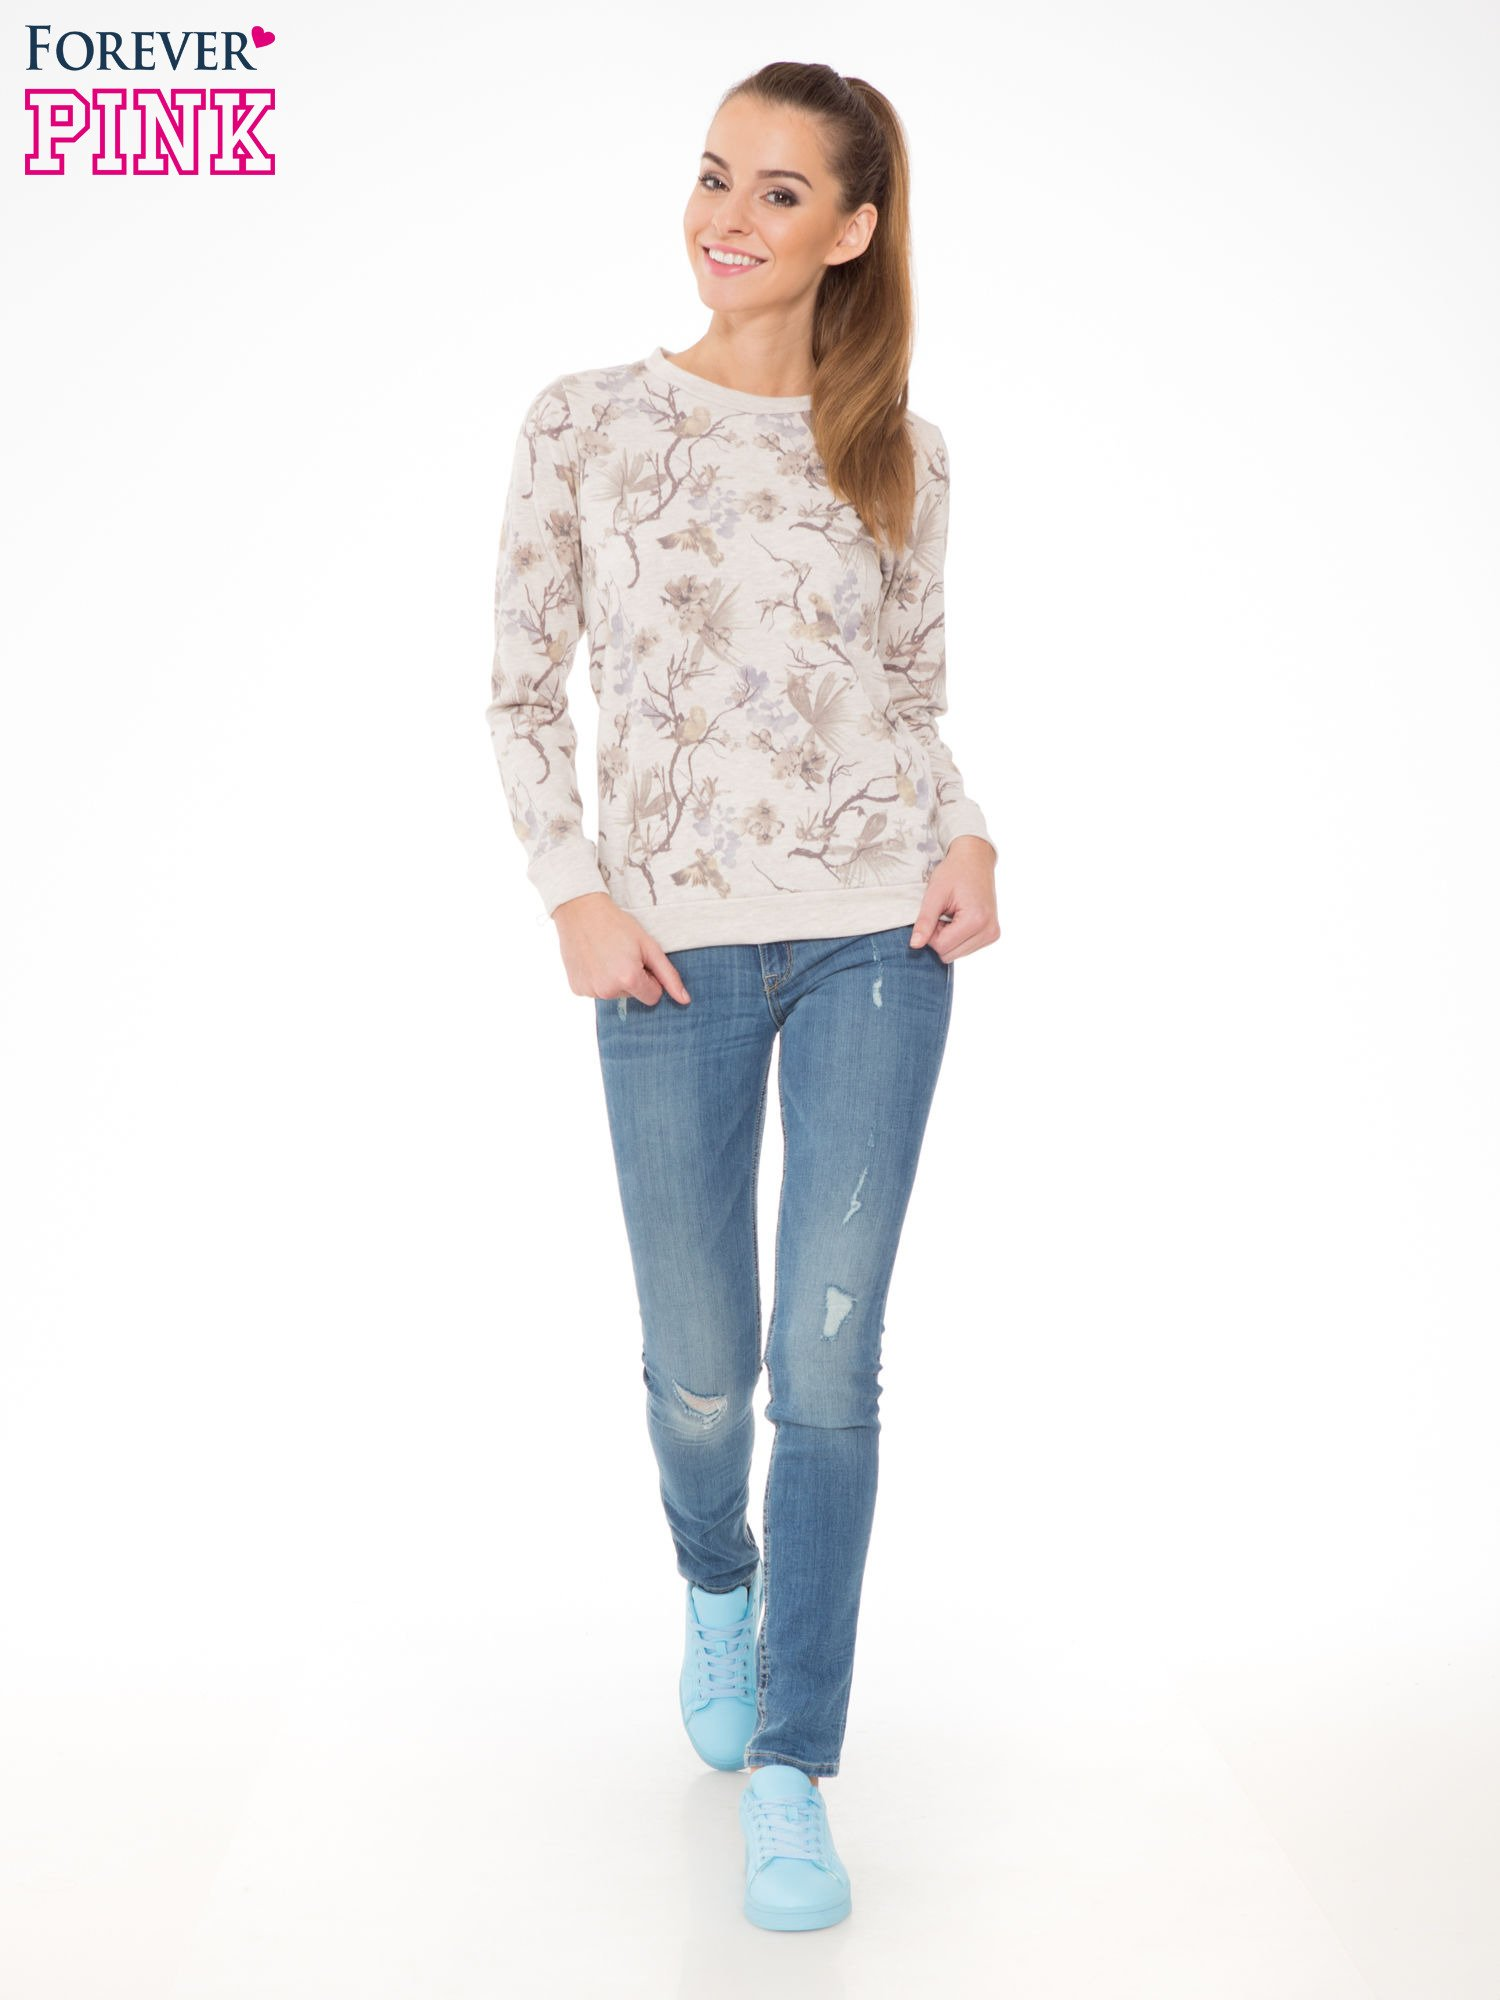 Beżowa bluza z nadrukiem all over floral print                                  zdj.                                  2